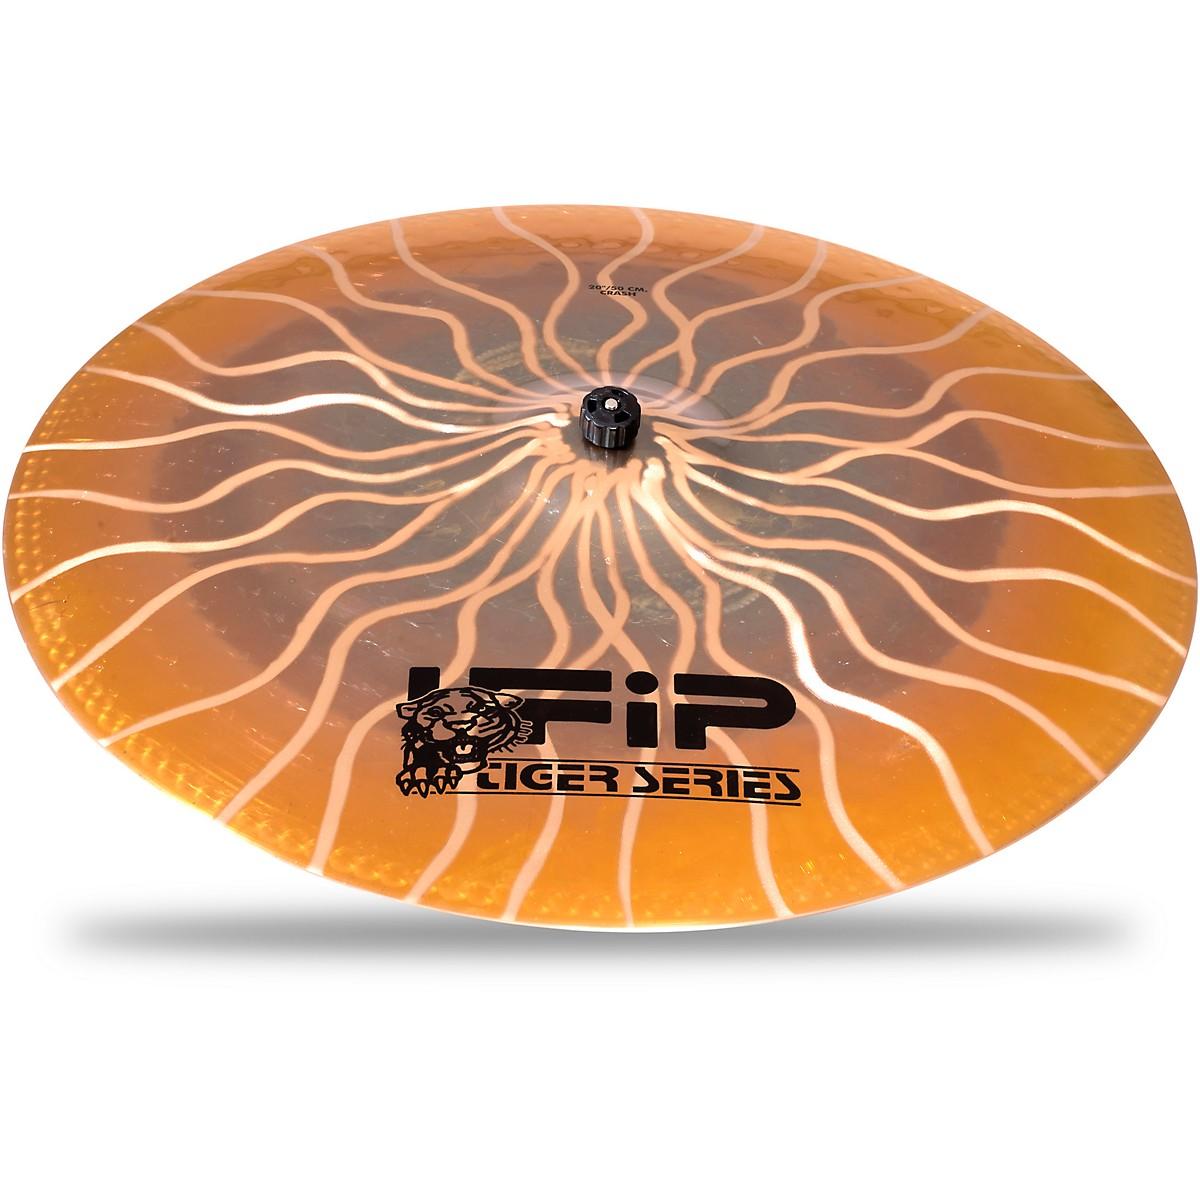 UFIP Tiger Series Crash Cymbal